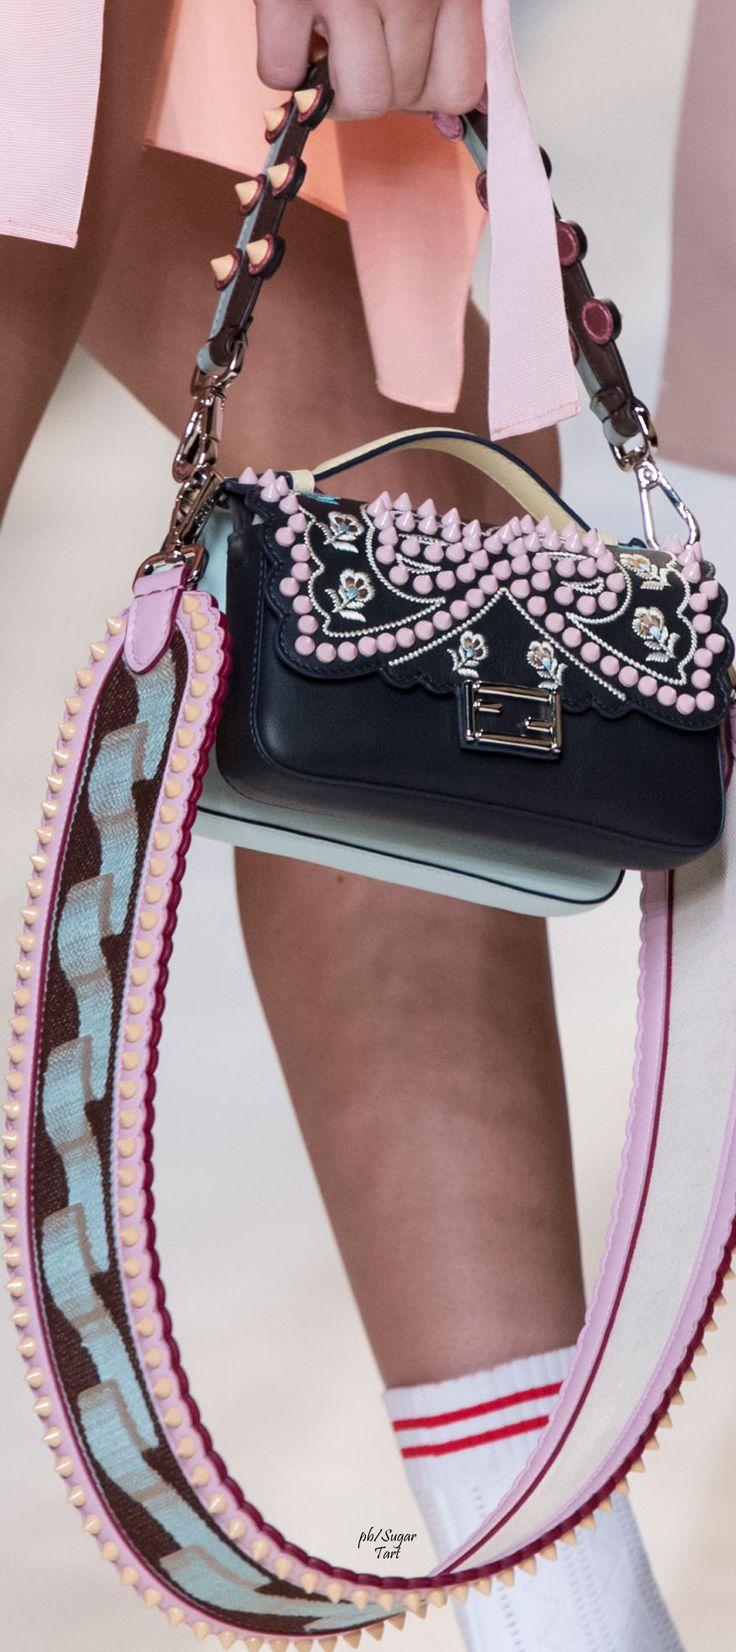 Fendi Spring 2017 Clothing, Shoes & Jewelry - women's handbags & wallets - http://amzn.to/2j9xWYI